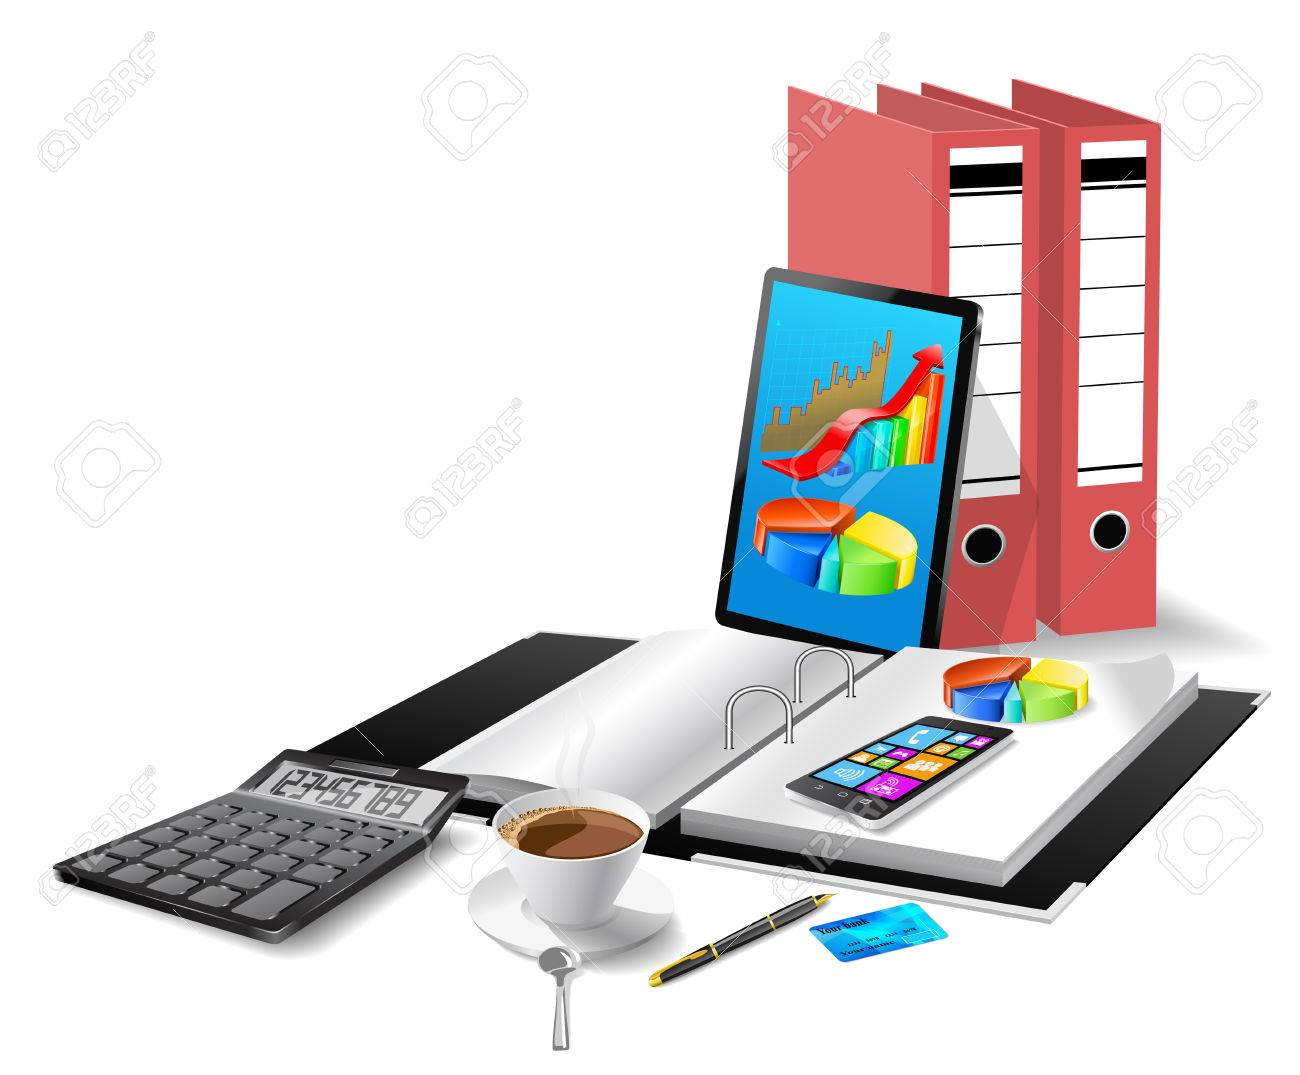 Office modern equipment - 27535722